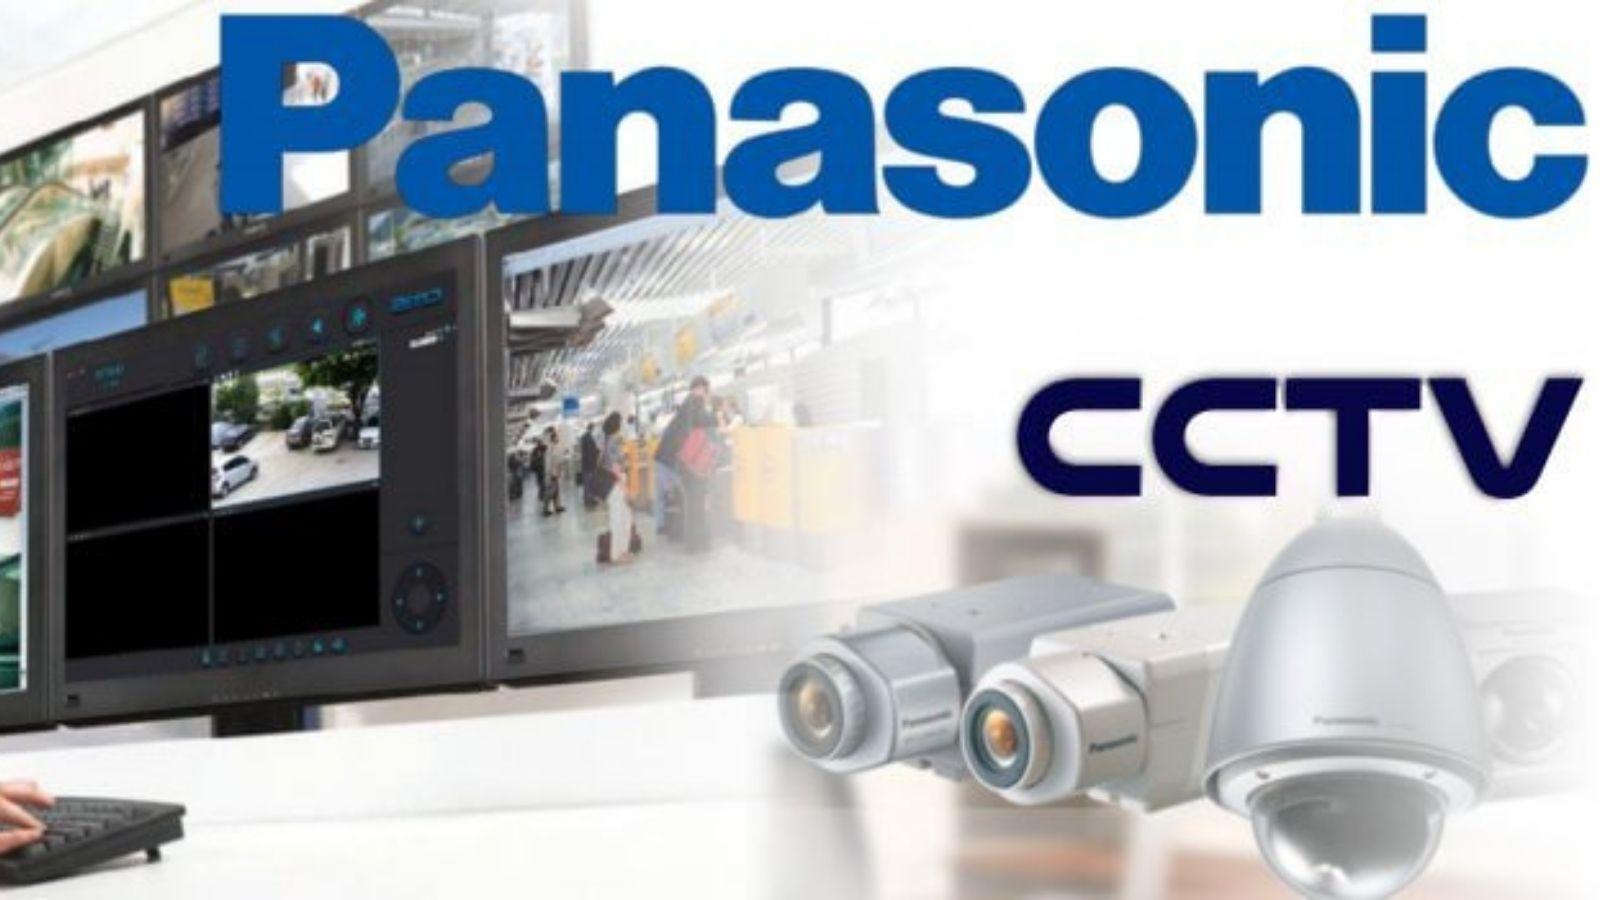 PANASONIC z nowym logo Logo mediarun com cctv